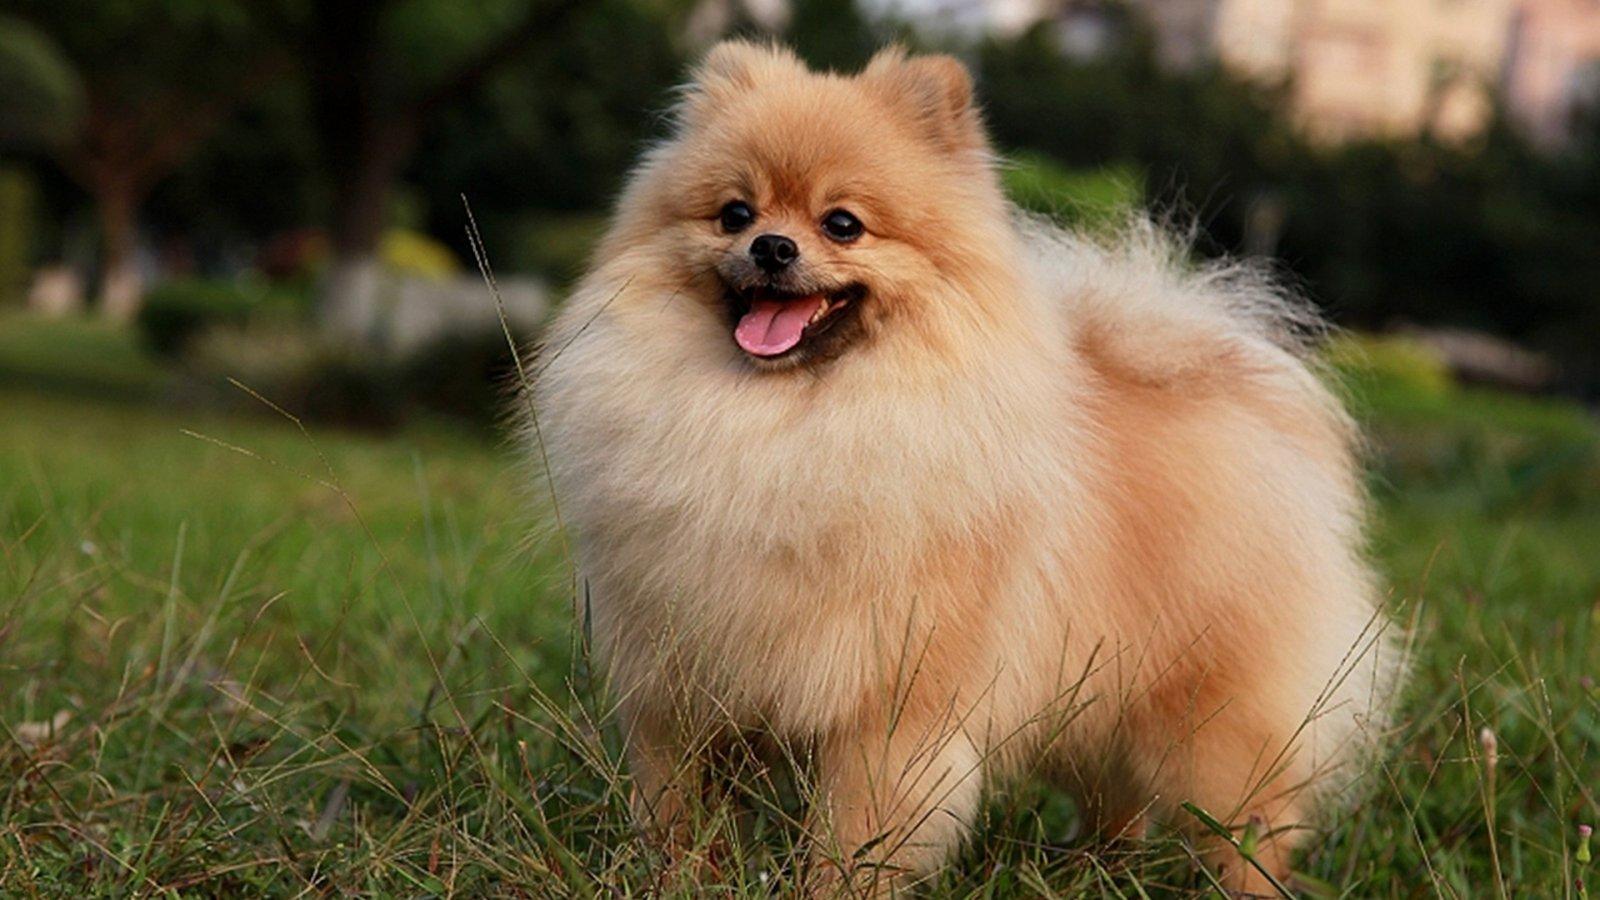 Where Can I Buy A Boo Dog